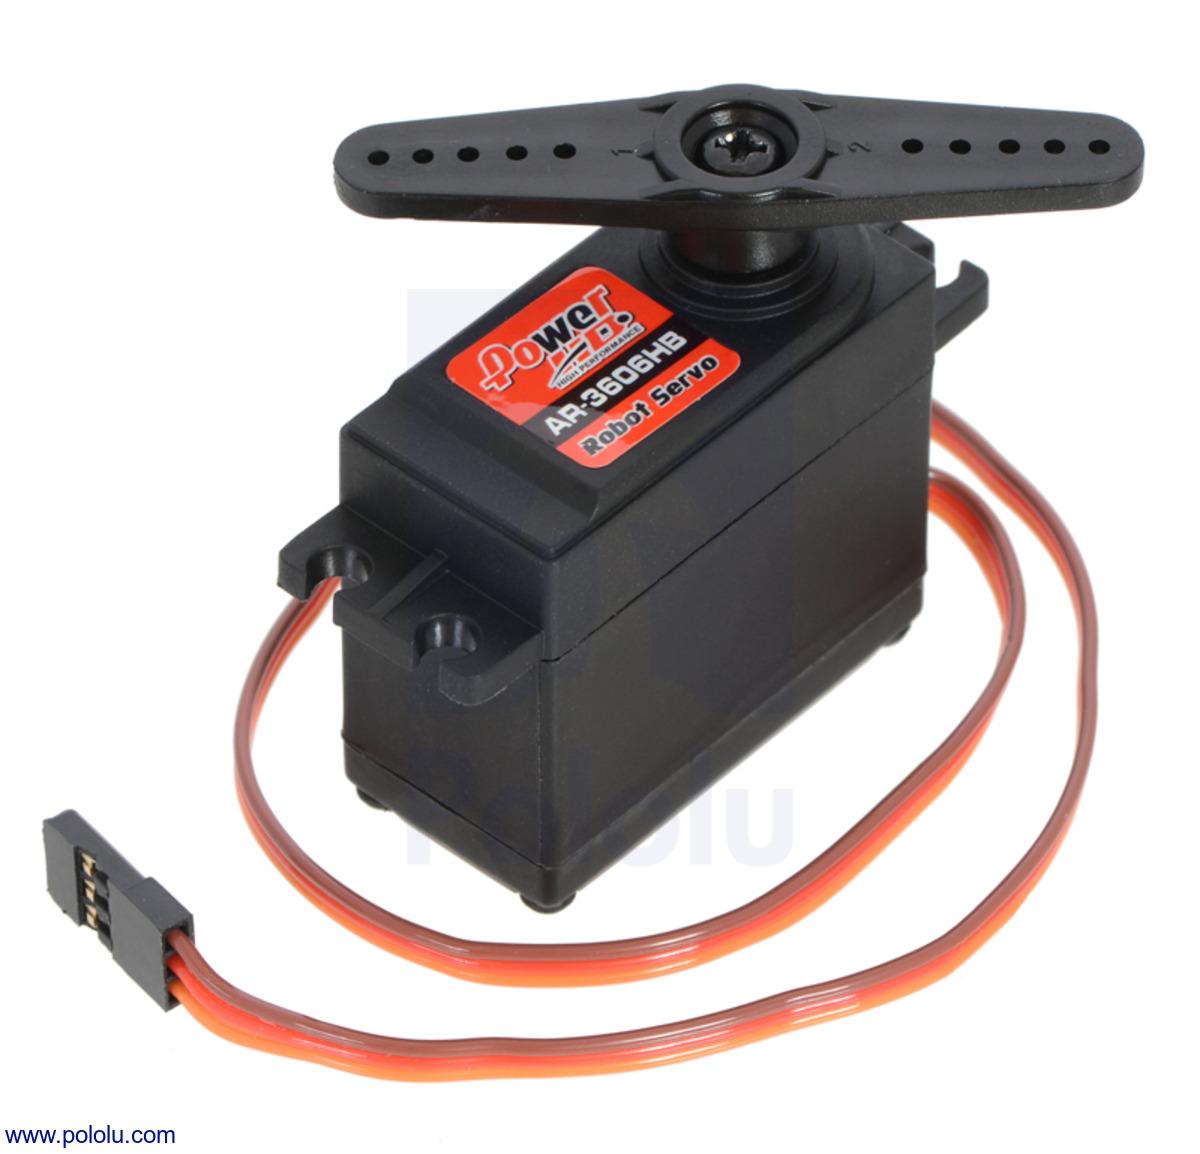 Pololu Power Hd Continuous Rotation Servo Ar 3606hb